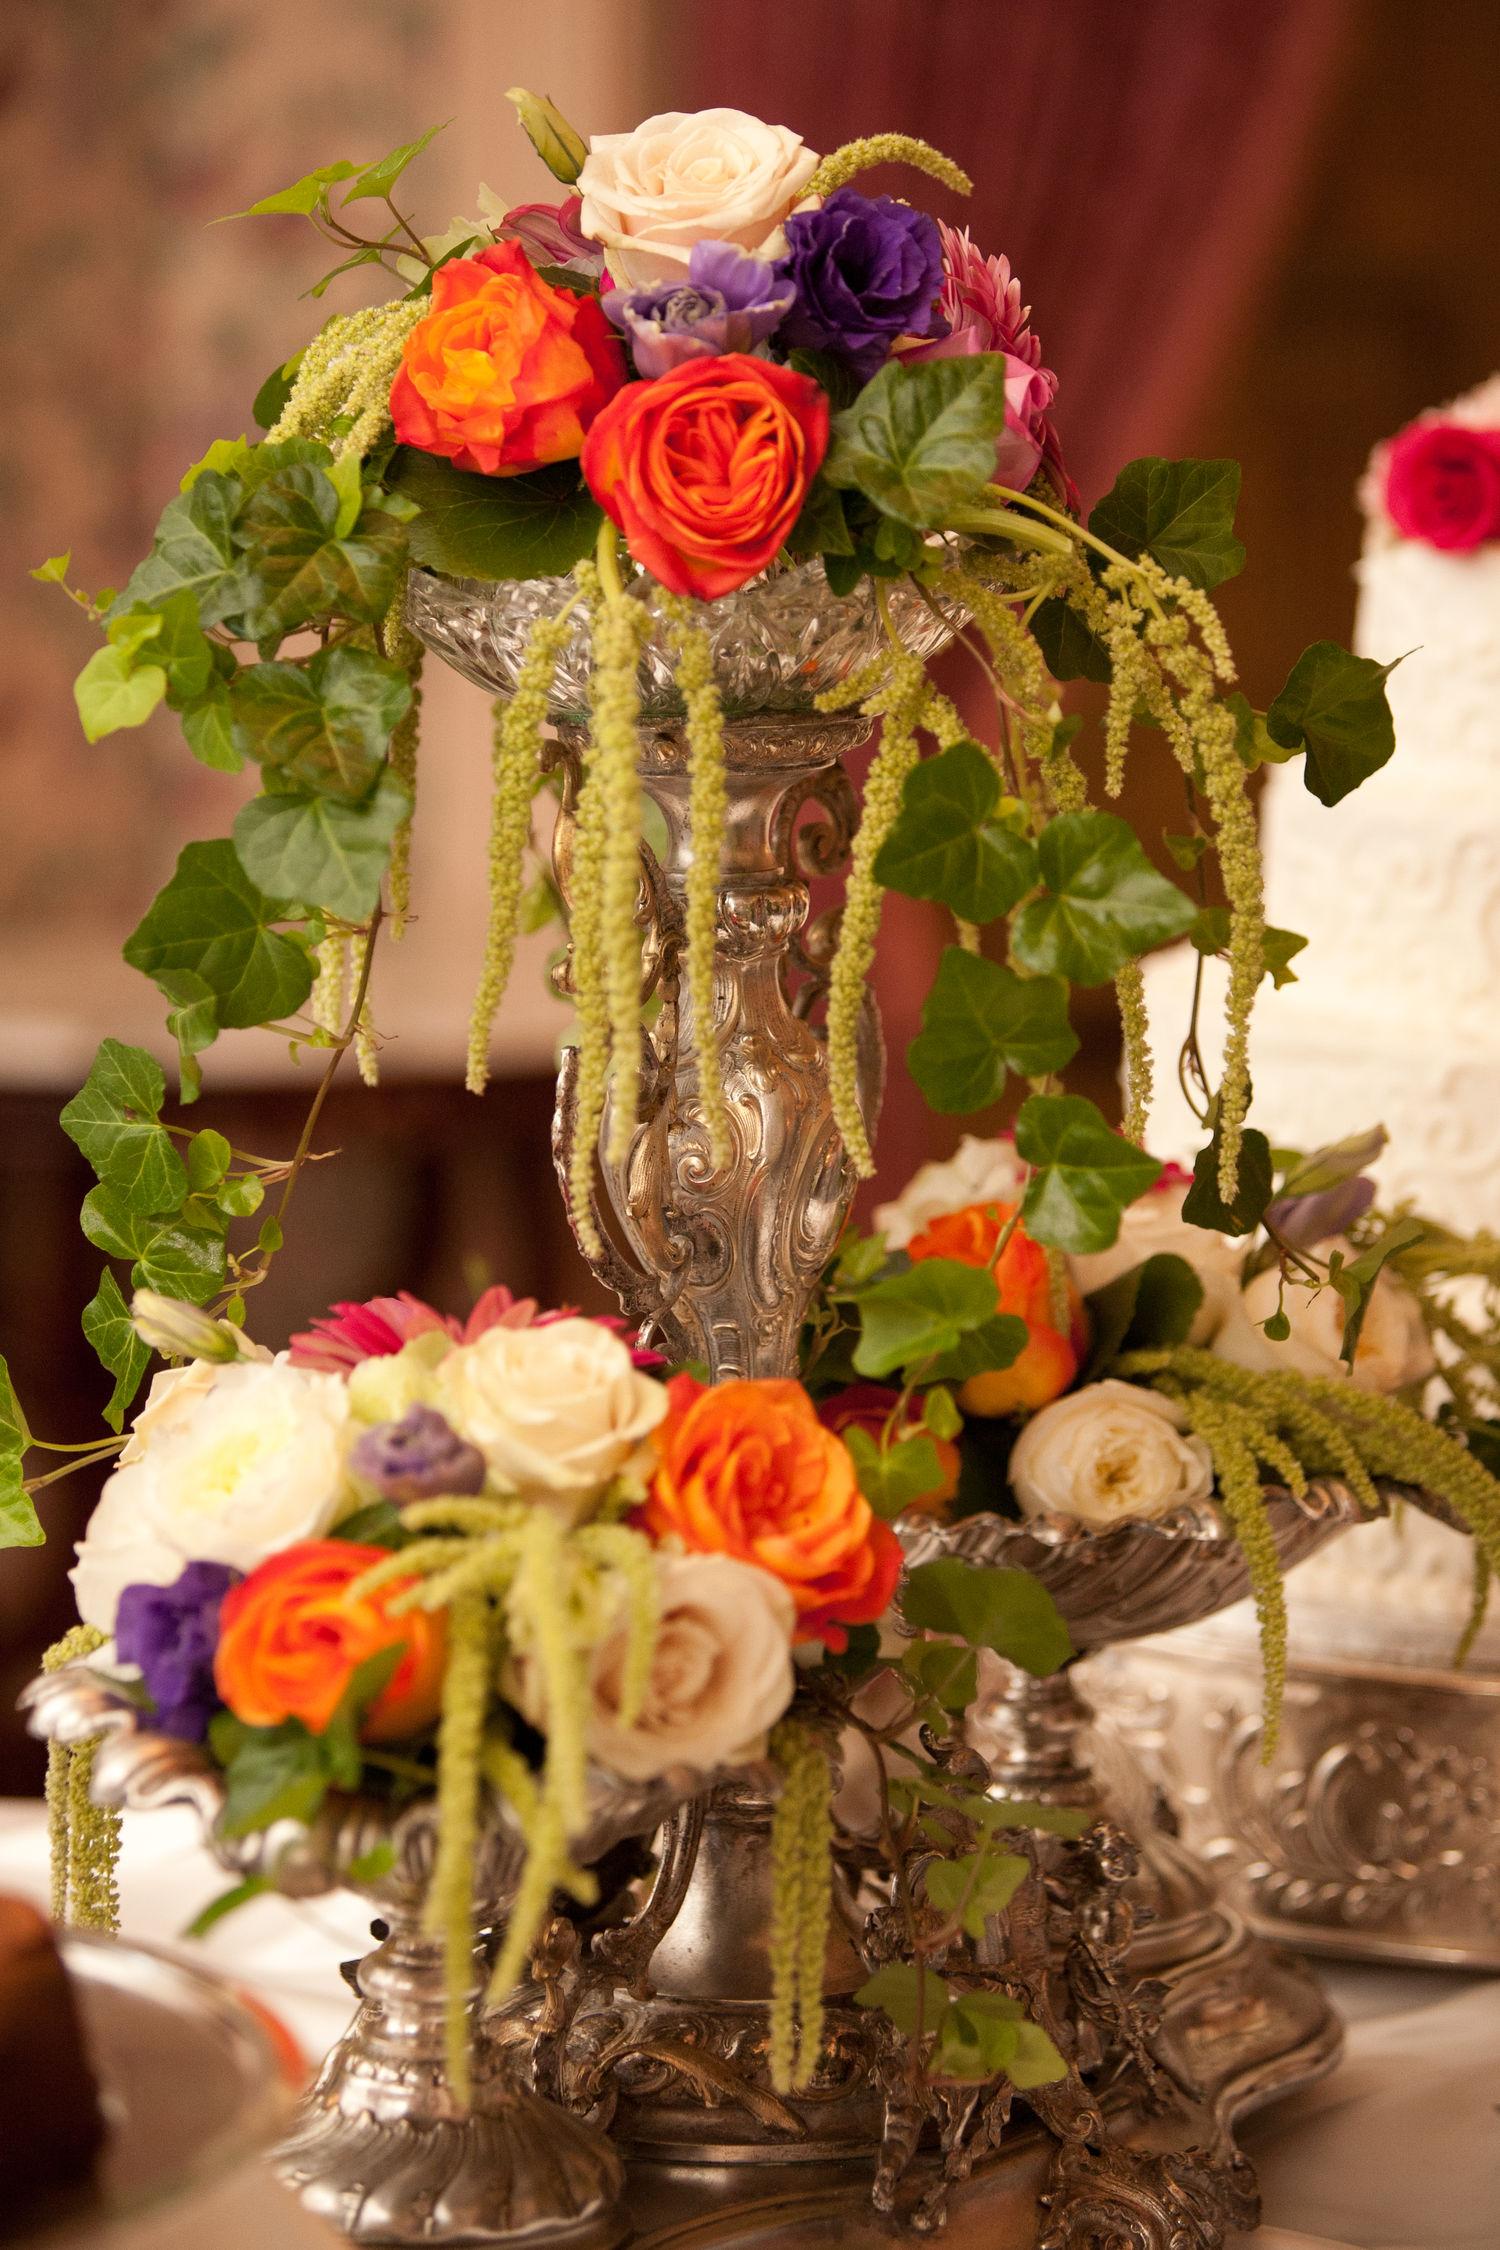 Wedding Reception Flowers centerpieces Decorations Carithers Florist Atlanta